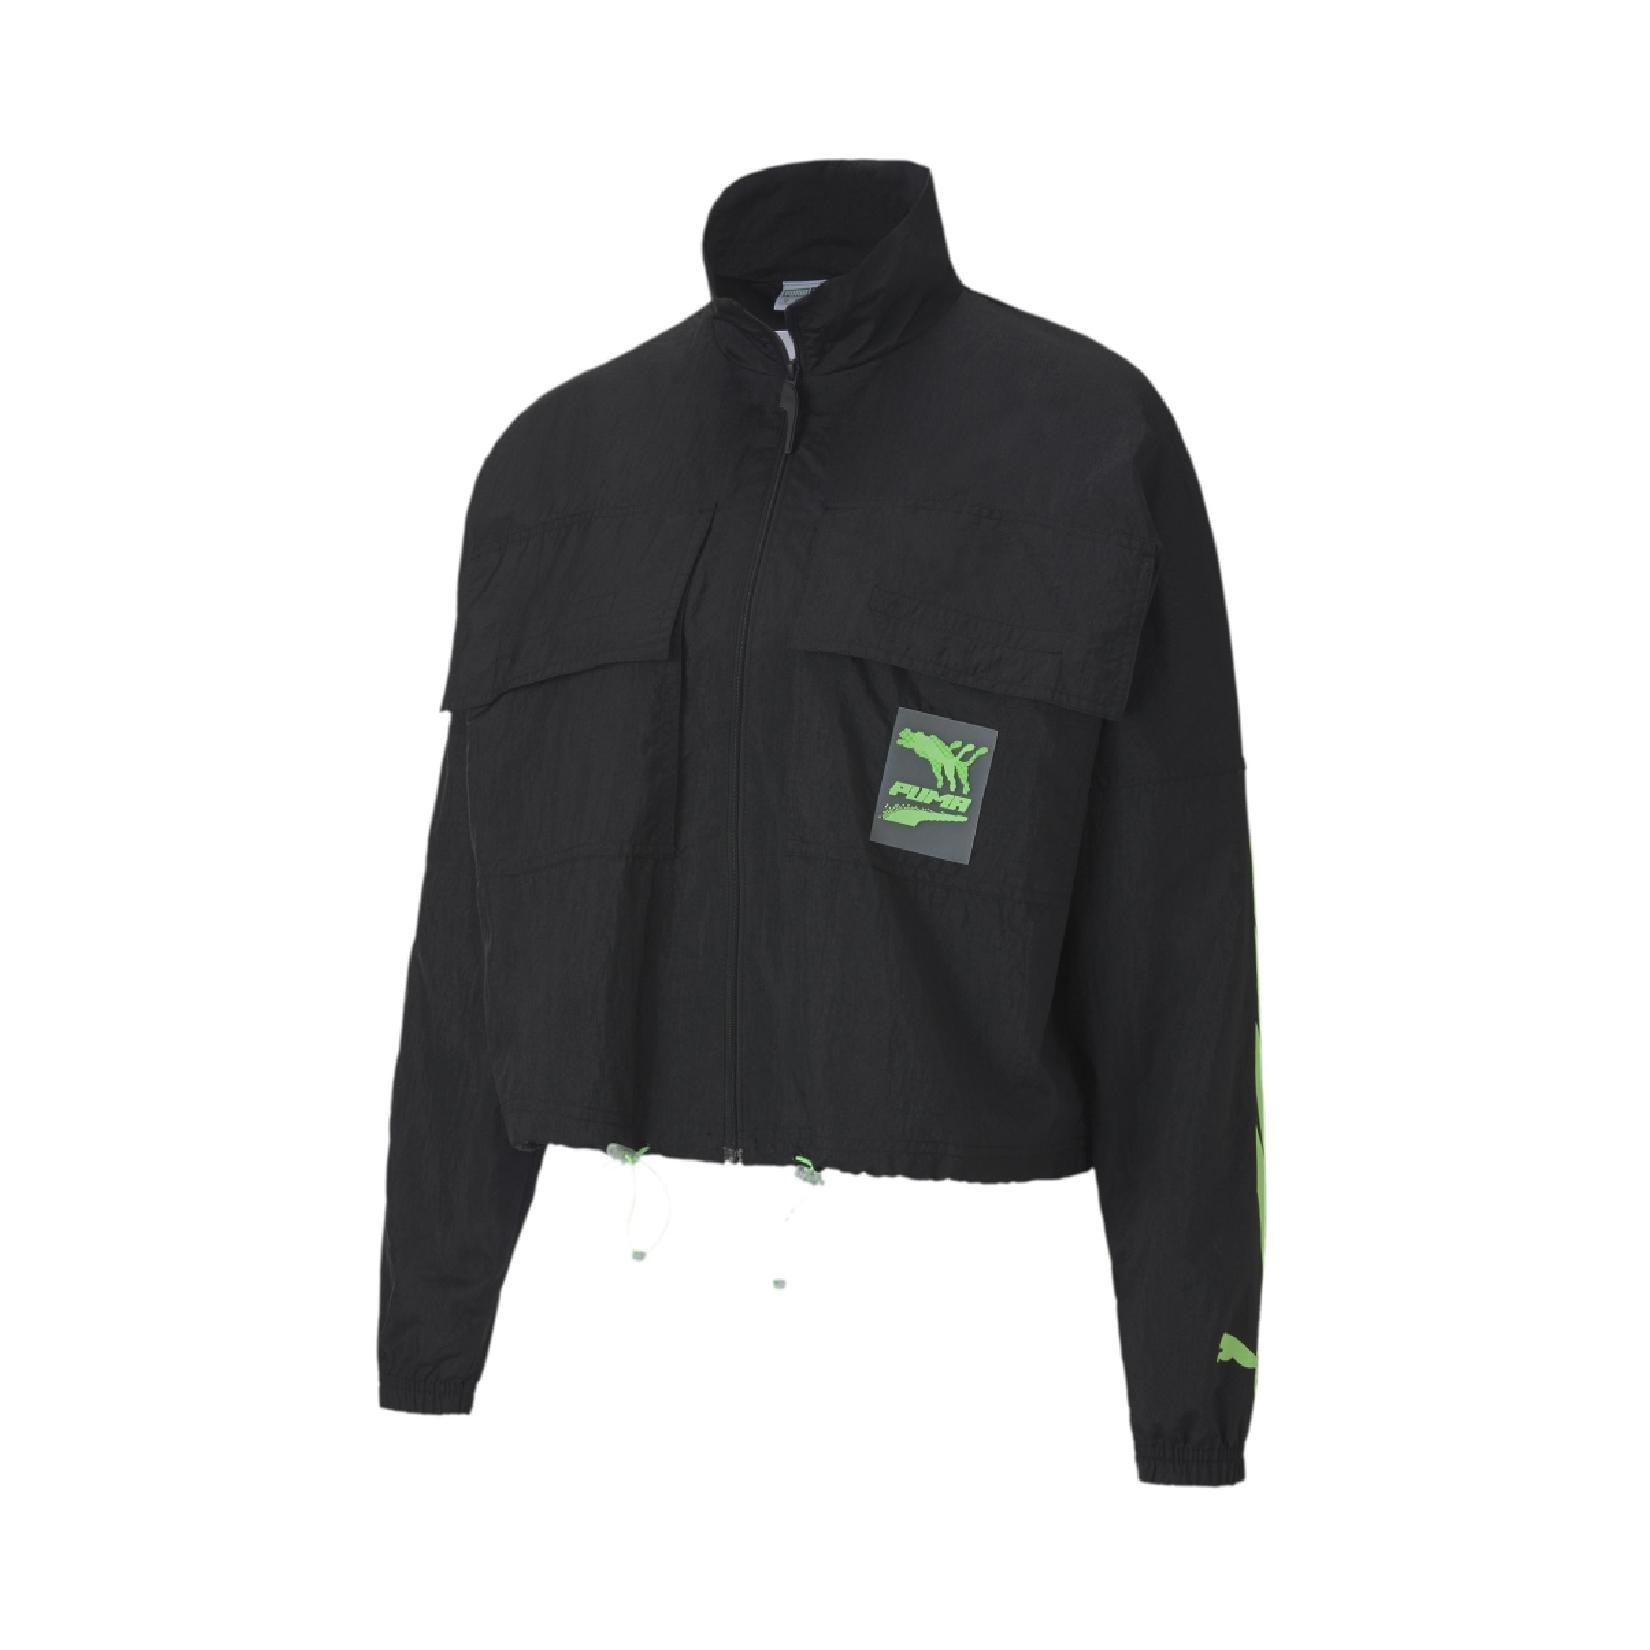 PUMA Evide Woven Women's Track Jacket Black